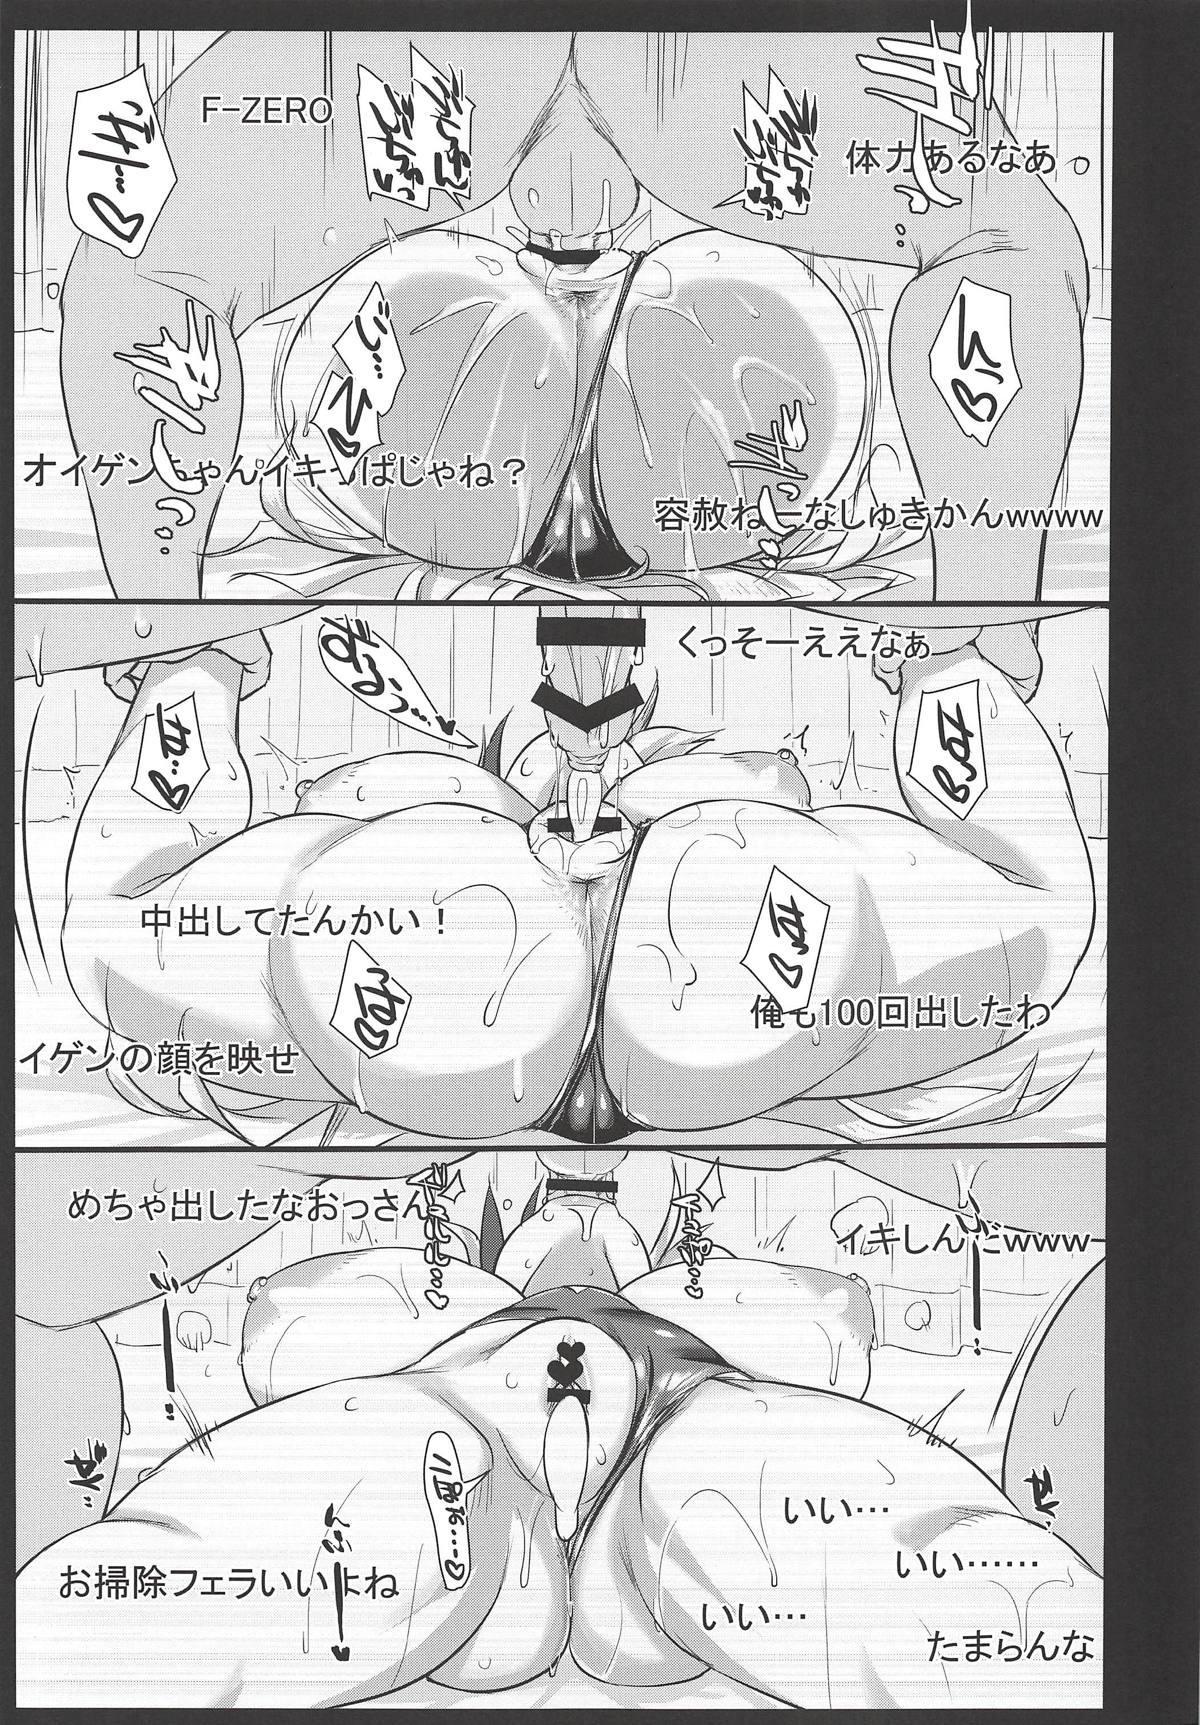 POV pert babe, Prinz Eugen. - Juujun Musume Hamedori Jikkyou Report 17